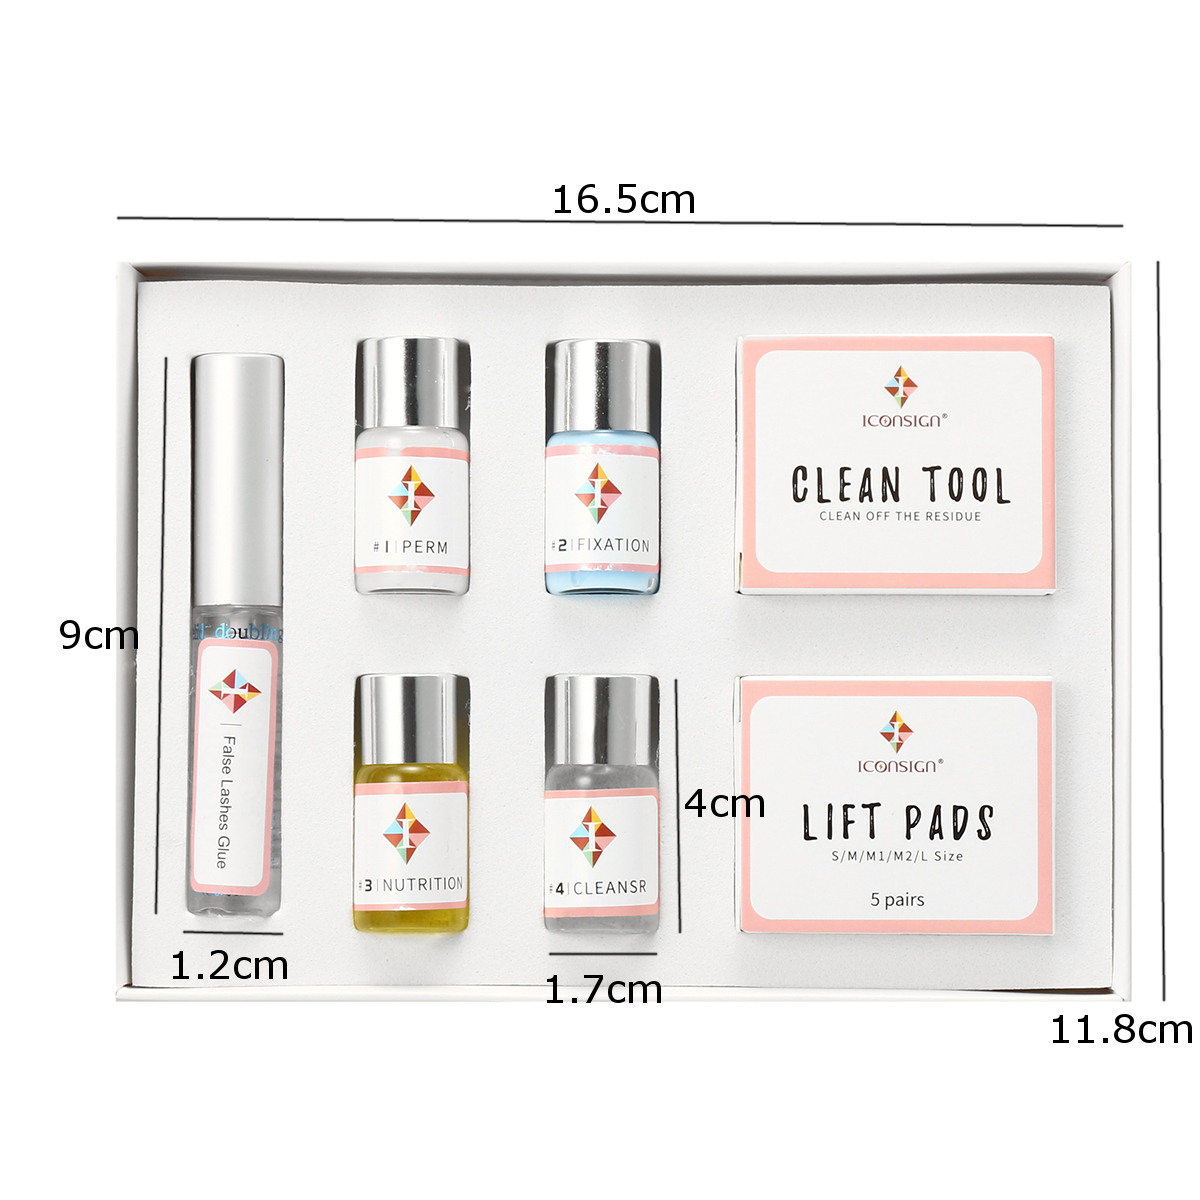 7Pcs/Set Eyelash Wave Lotion Curling Perm Curler Kit Eye Lashes Lift Liquid Makeup Tool Women Eyes Makeup Beauty Accessories New